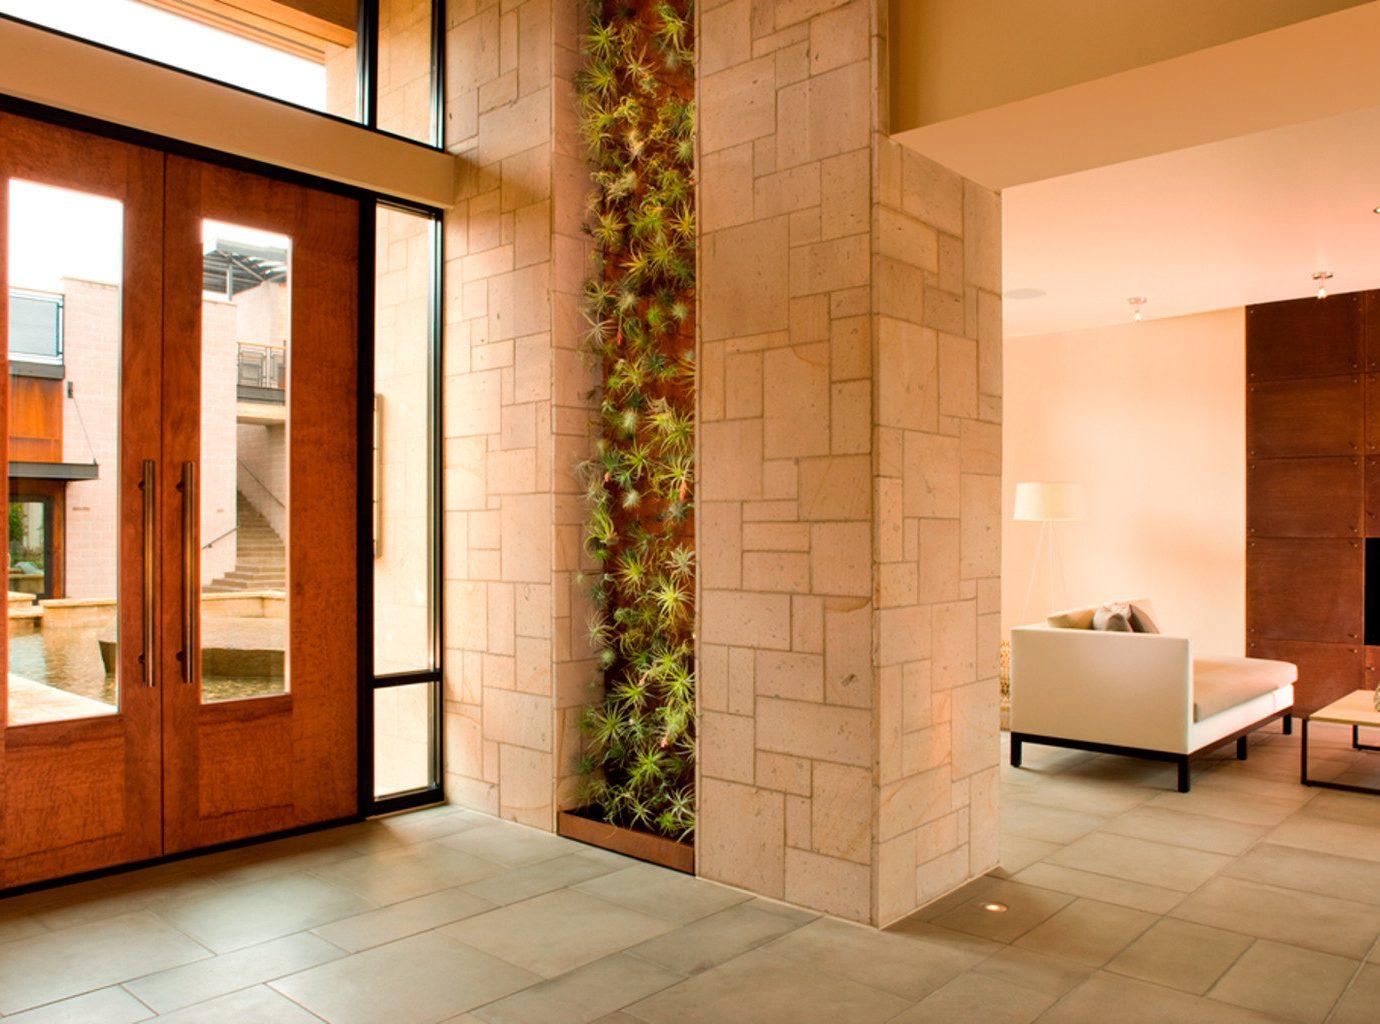 Boutique Eco Elegant Fireplace Lobby Lounge building property Architecture hardwood flooring home professional wood flooring door living room tile tiled